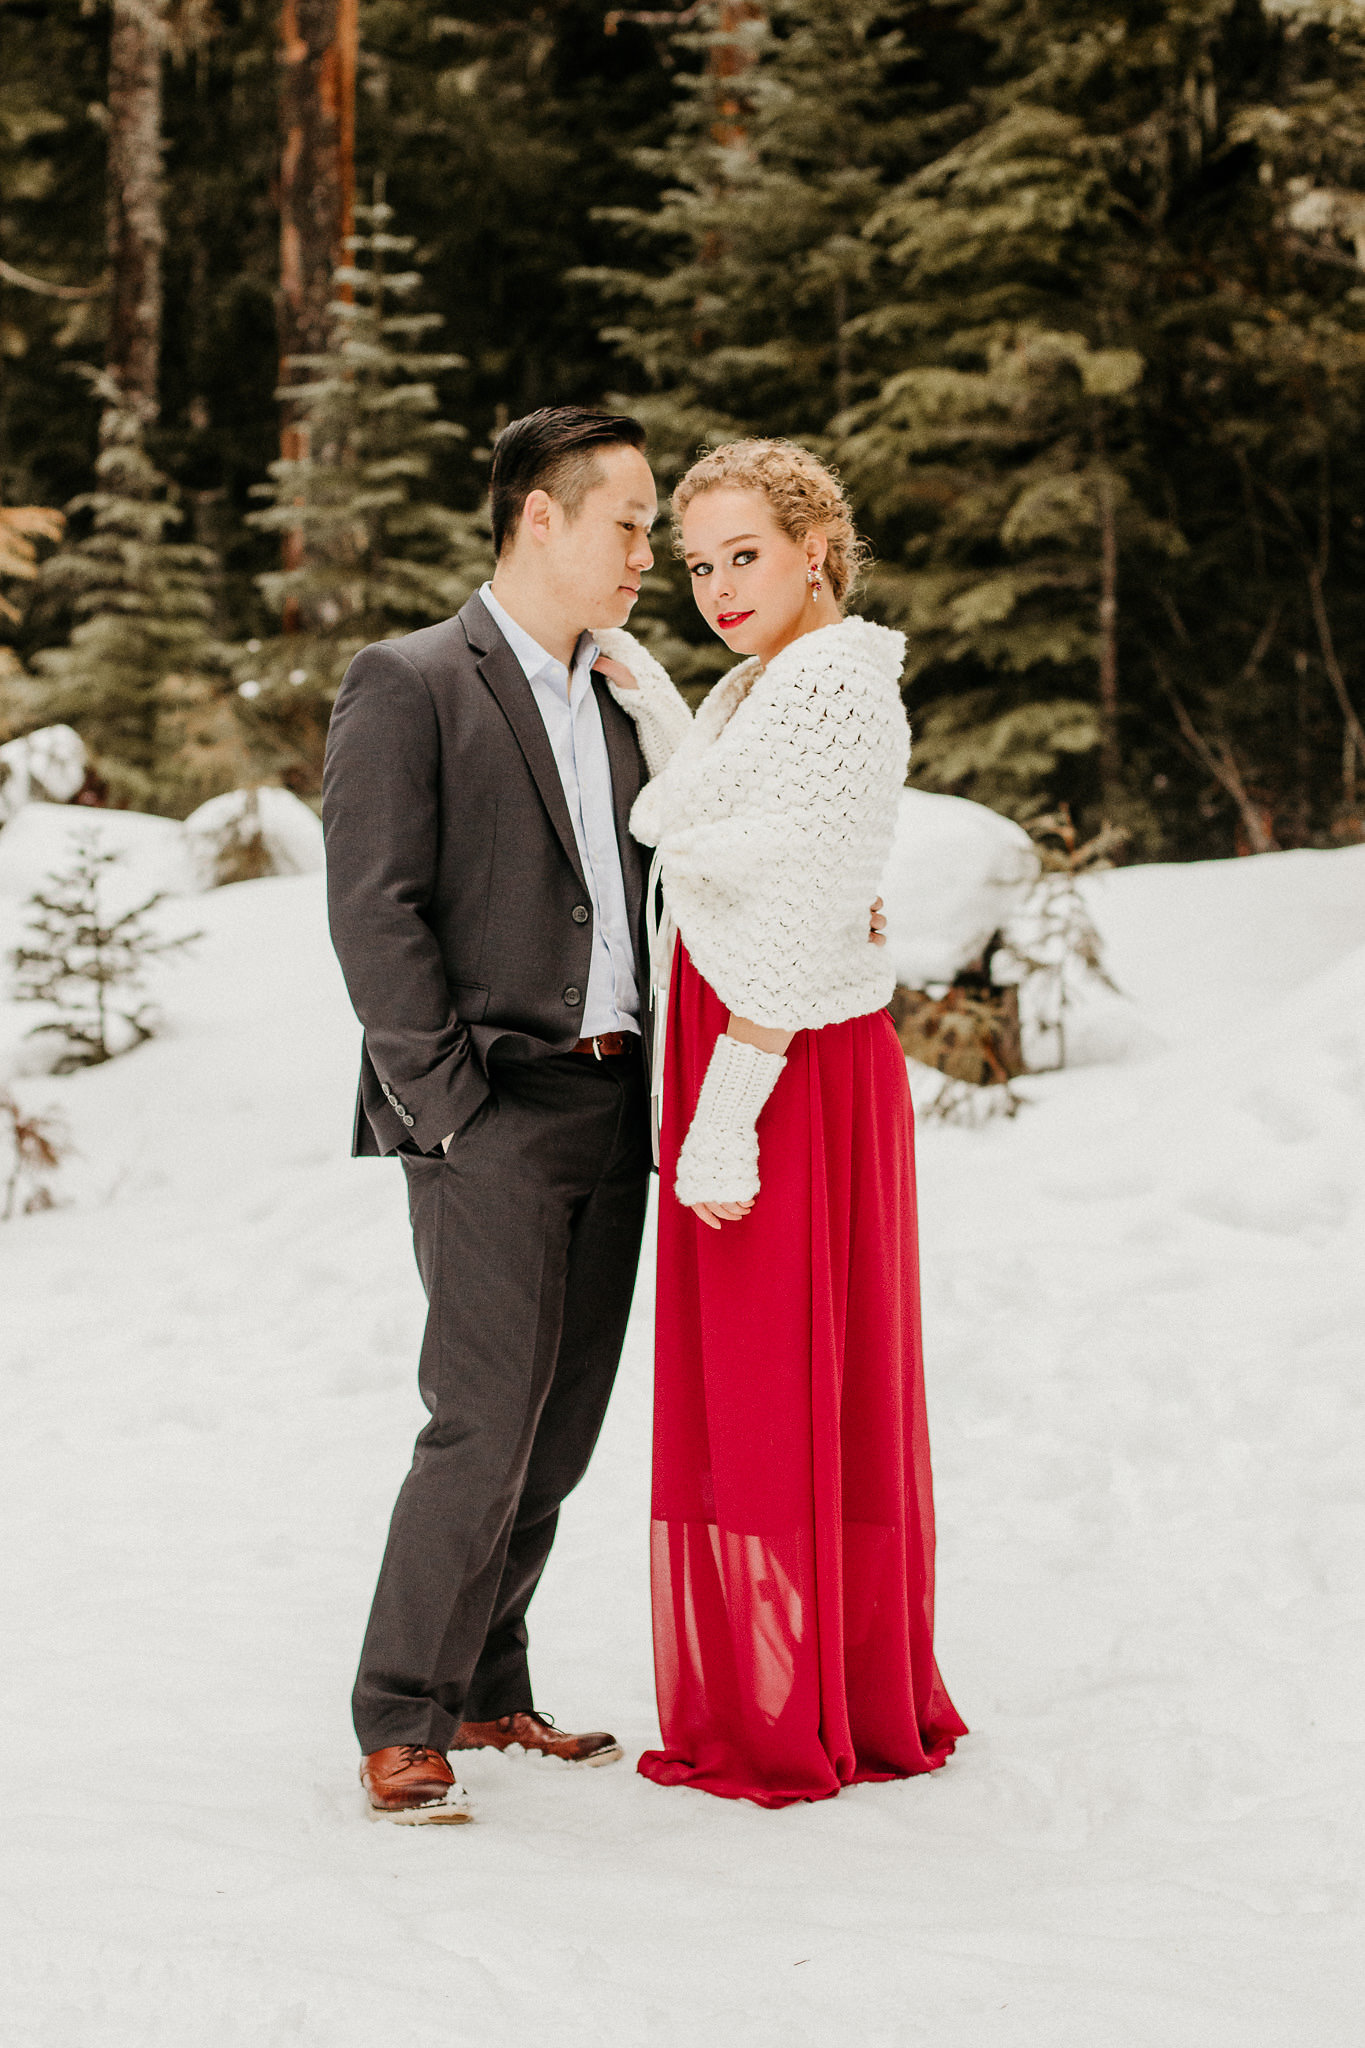 wedding photography style.jpg